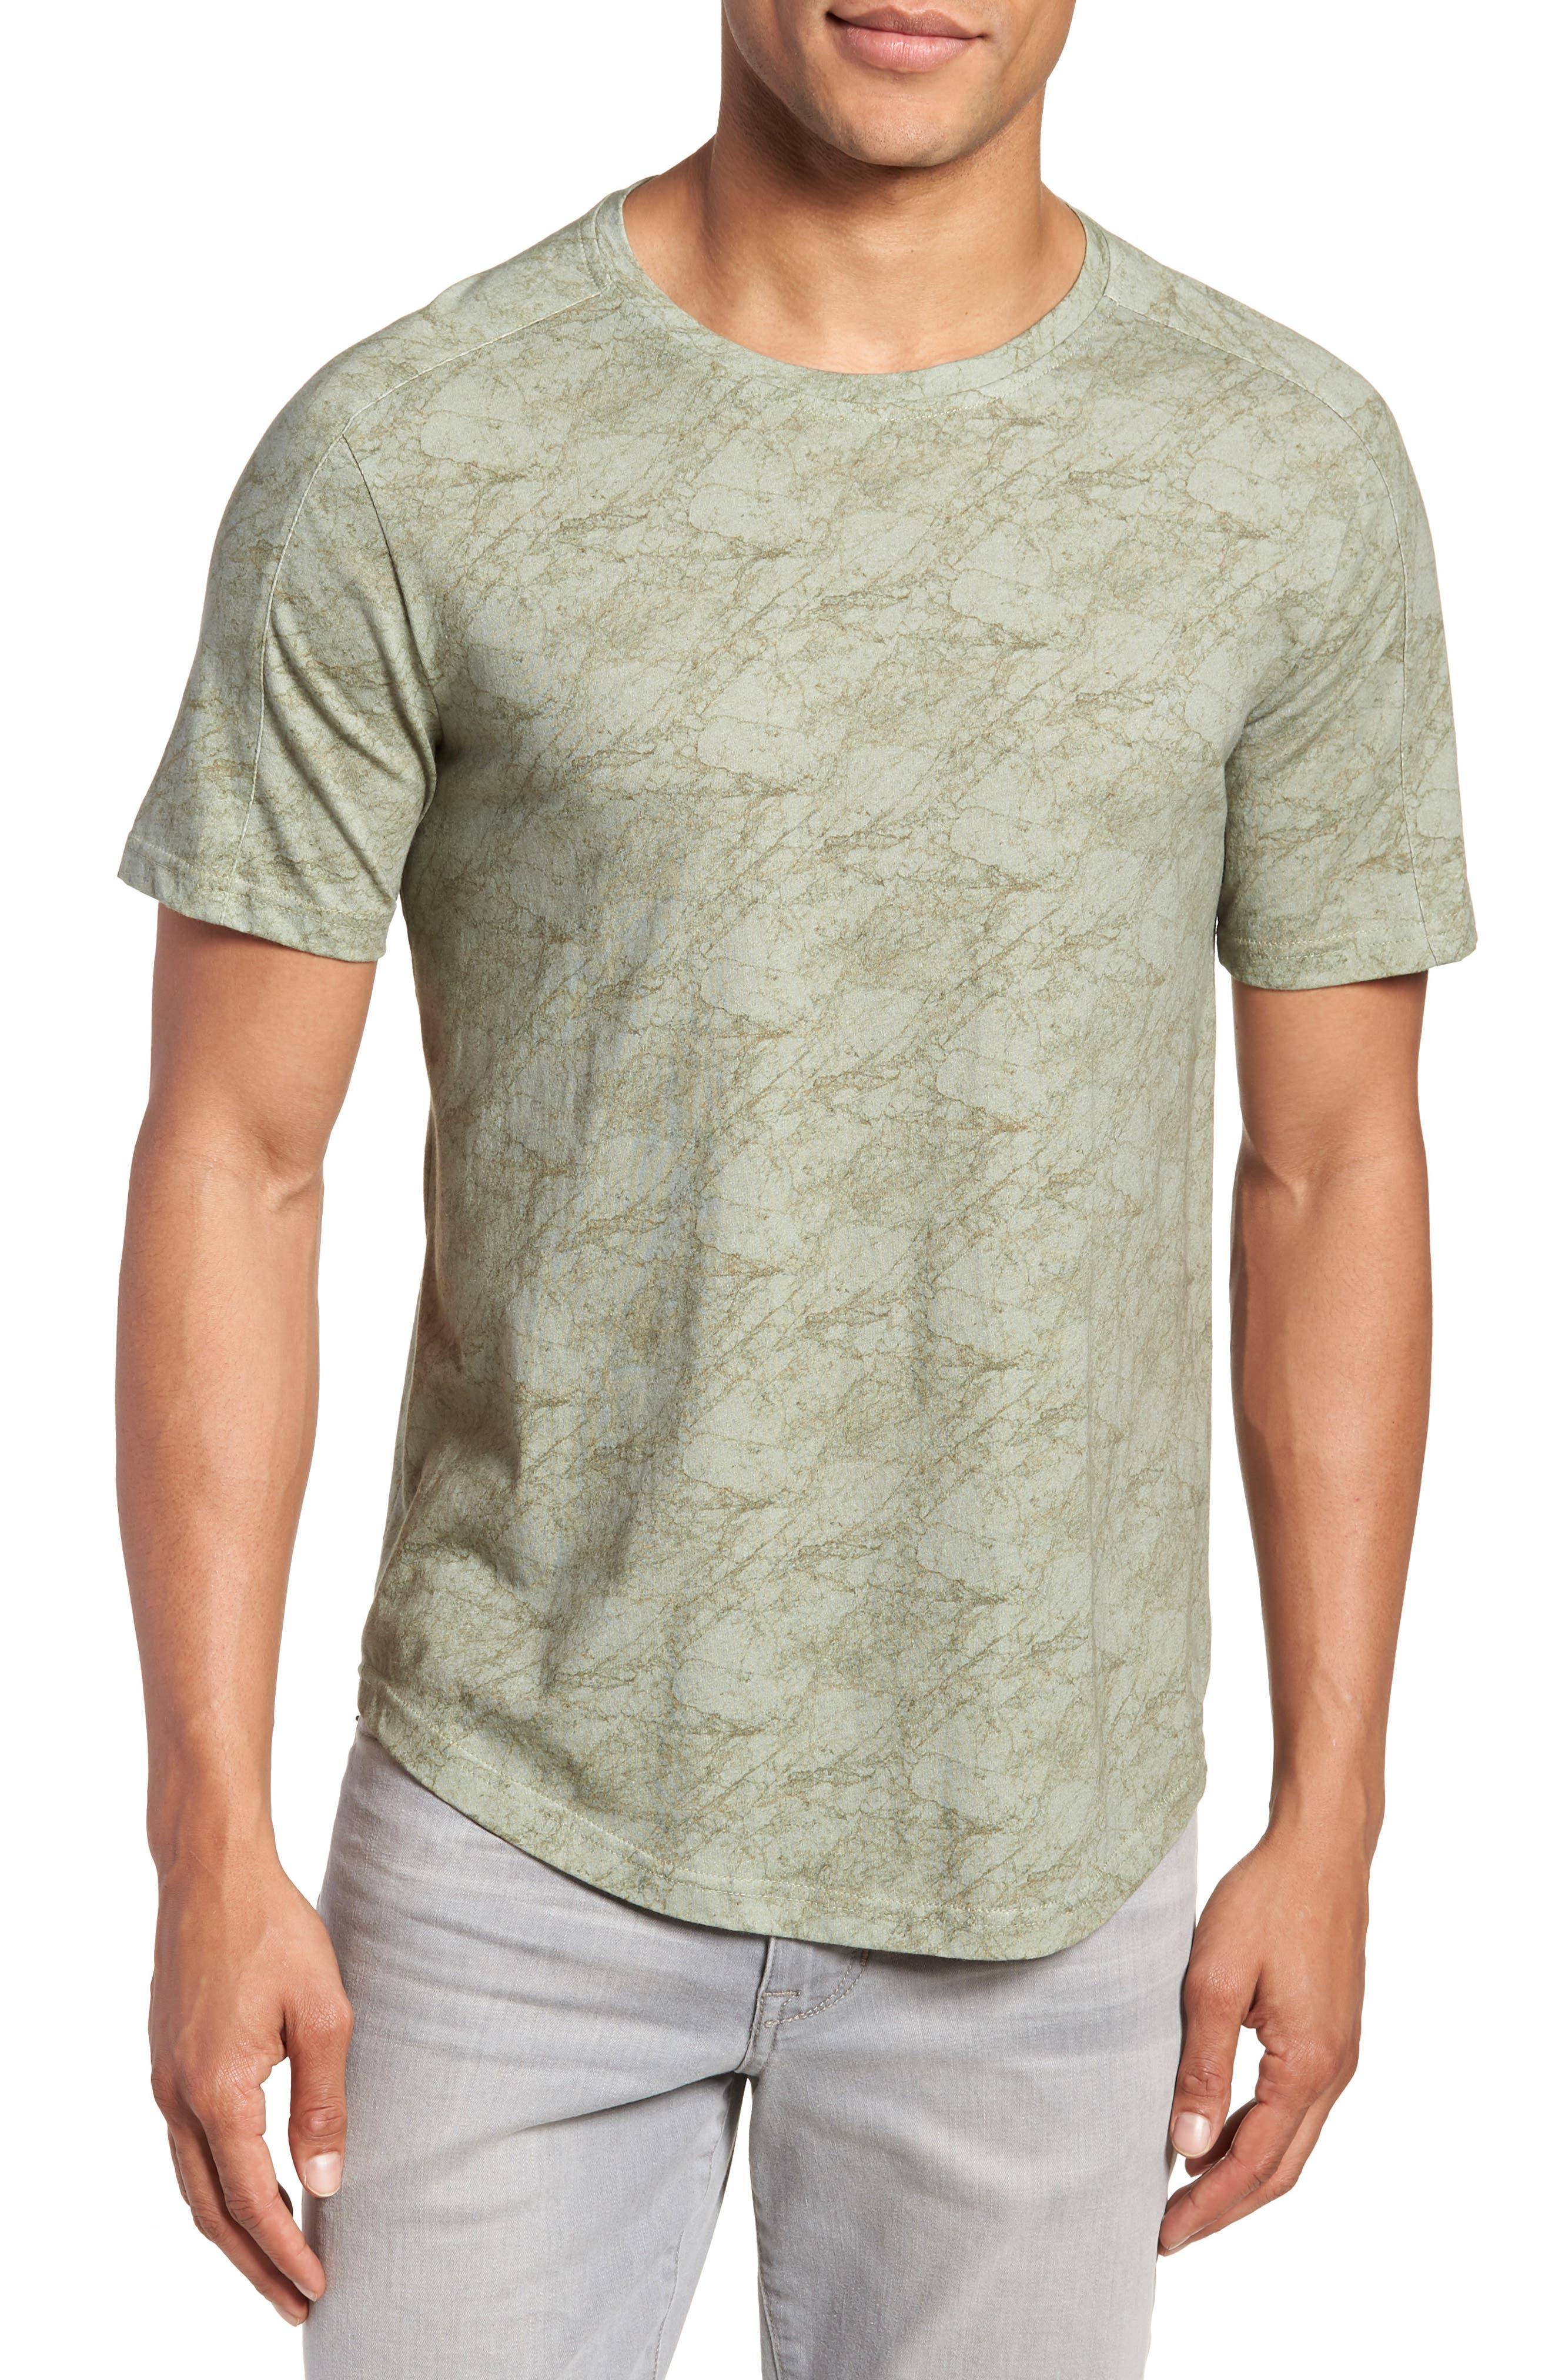 Chelsea Marble Print T-Shirt,                             Main thumbnail 1, color,                             300